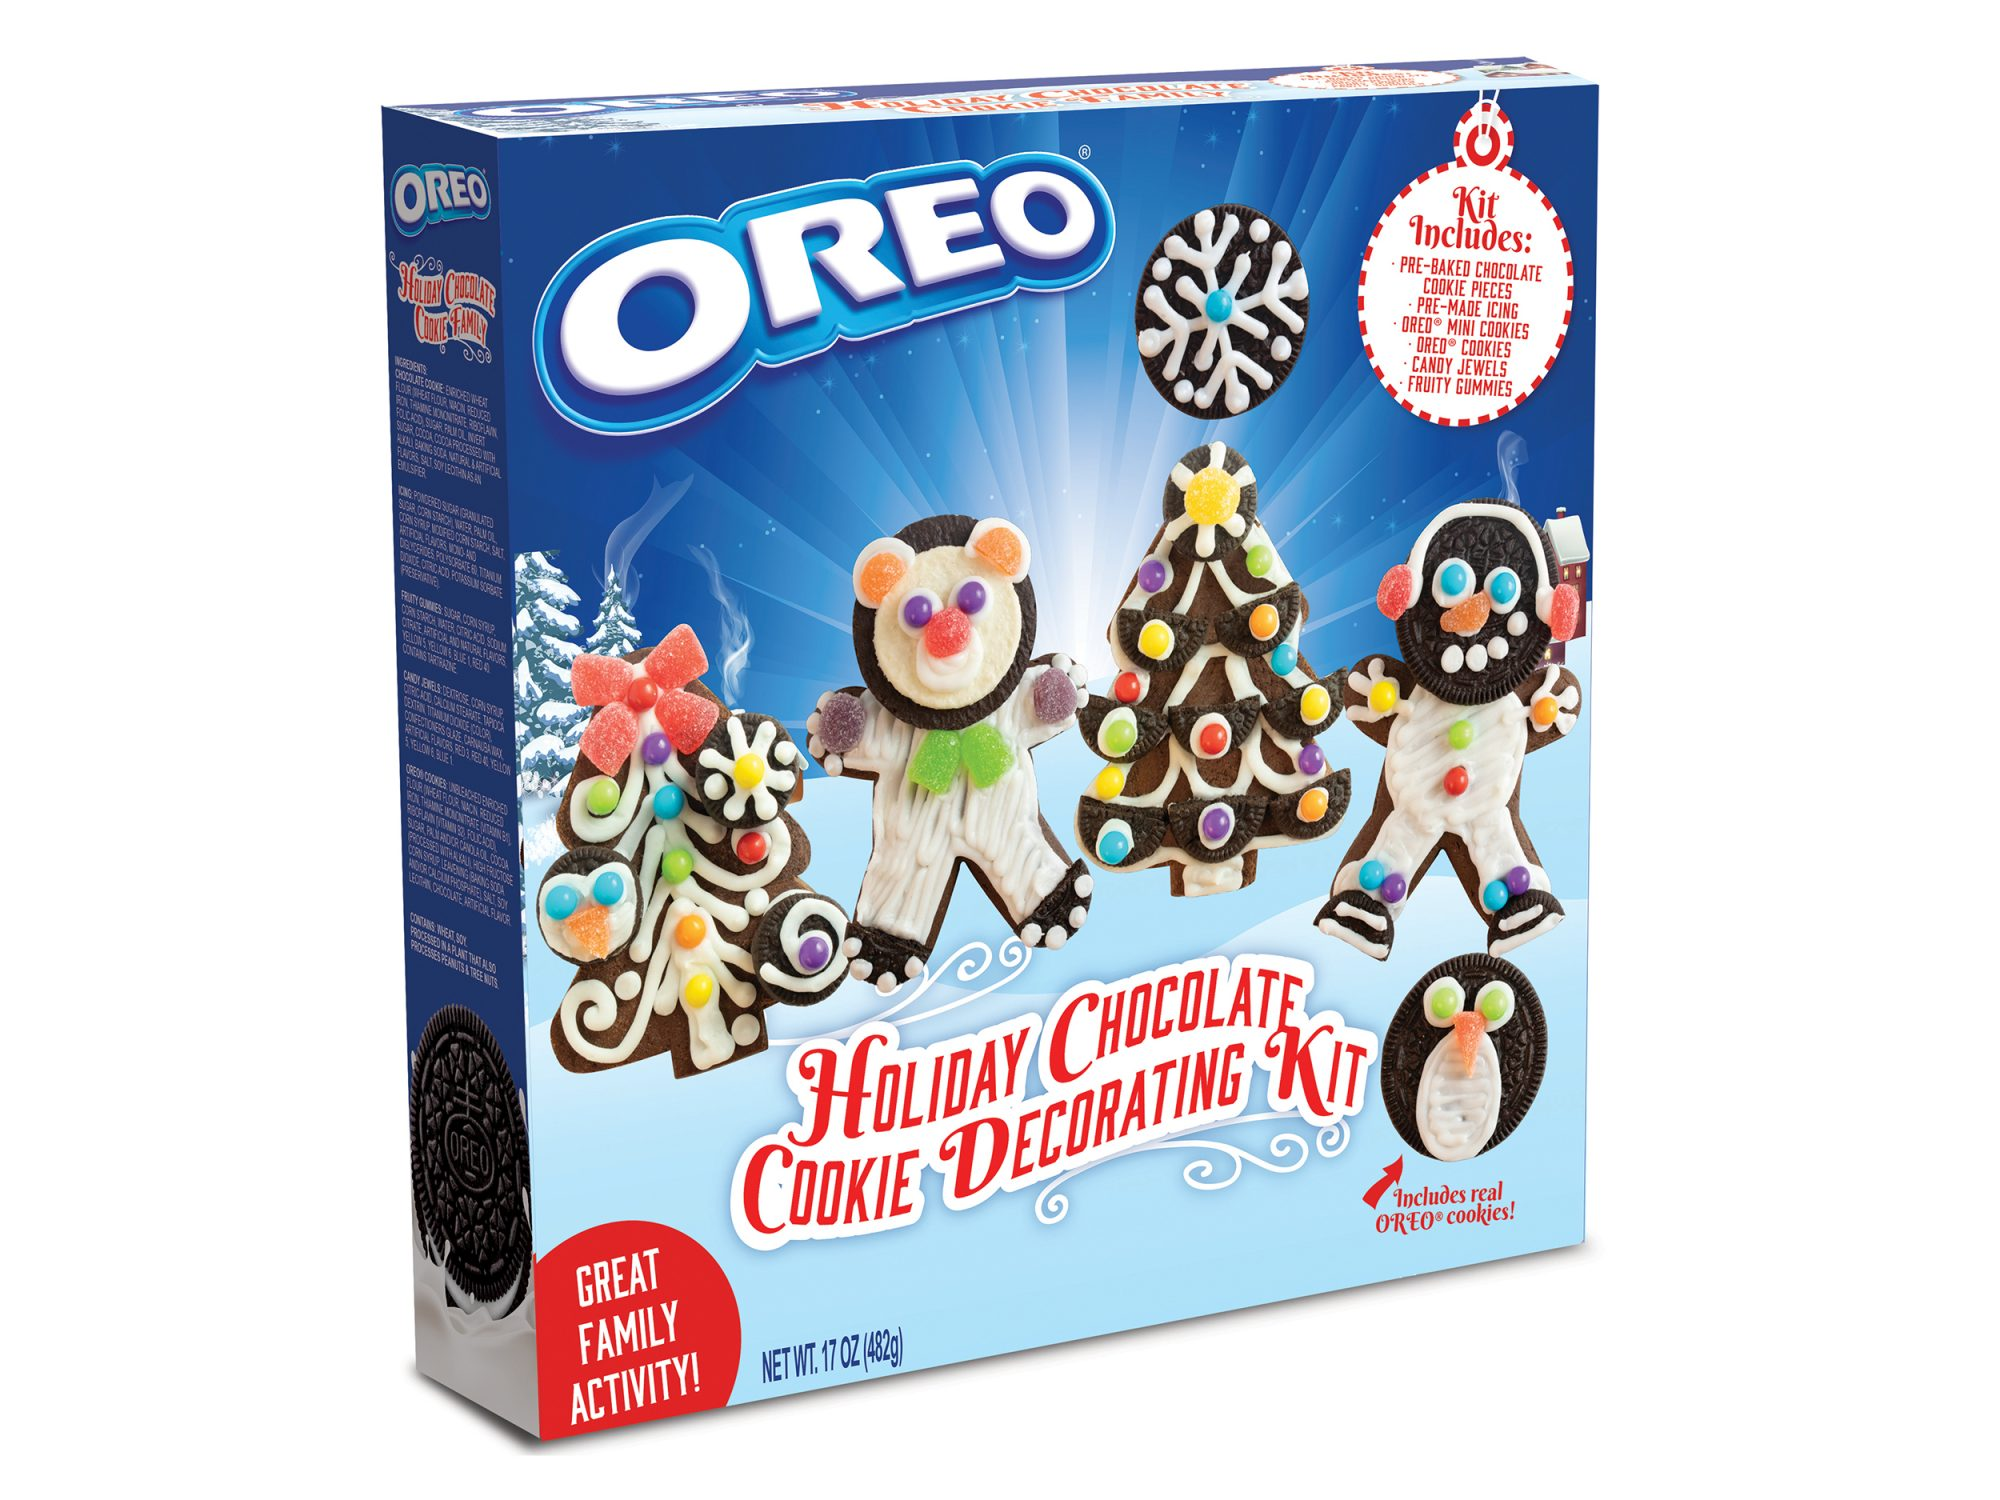 OREO Holiday Chocolate Cookie Decorating Kit